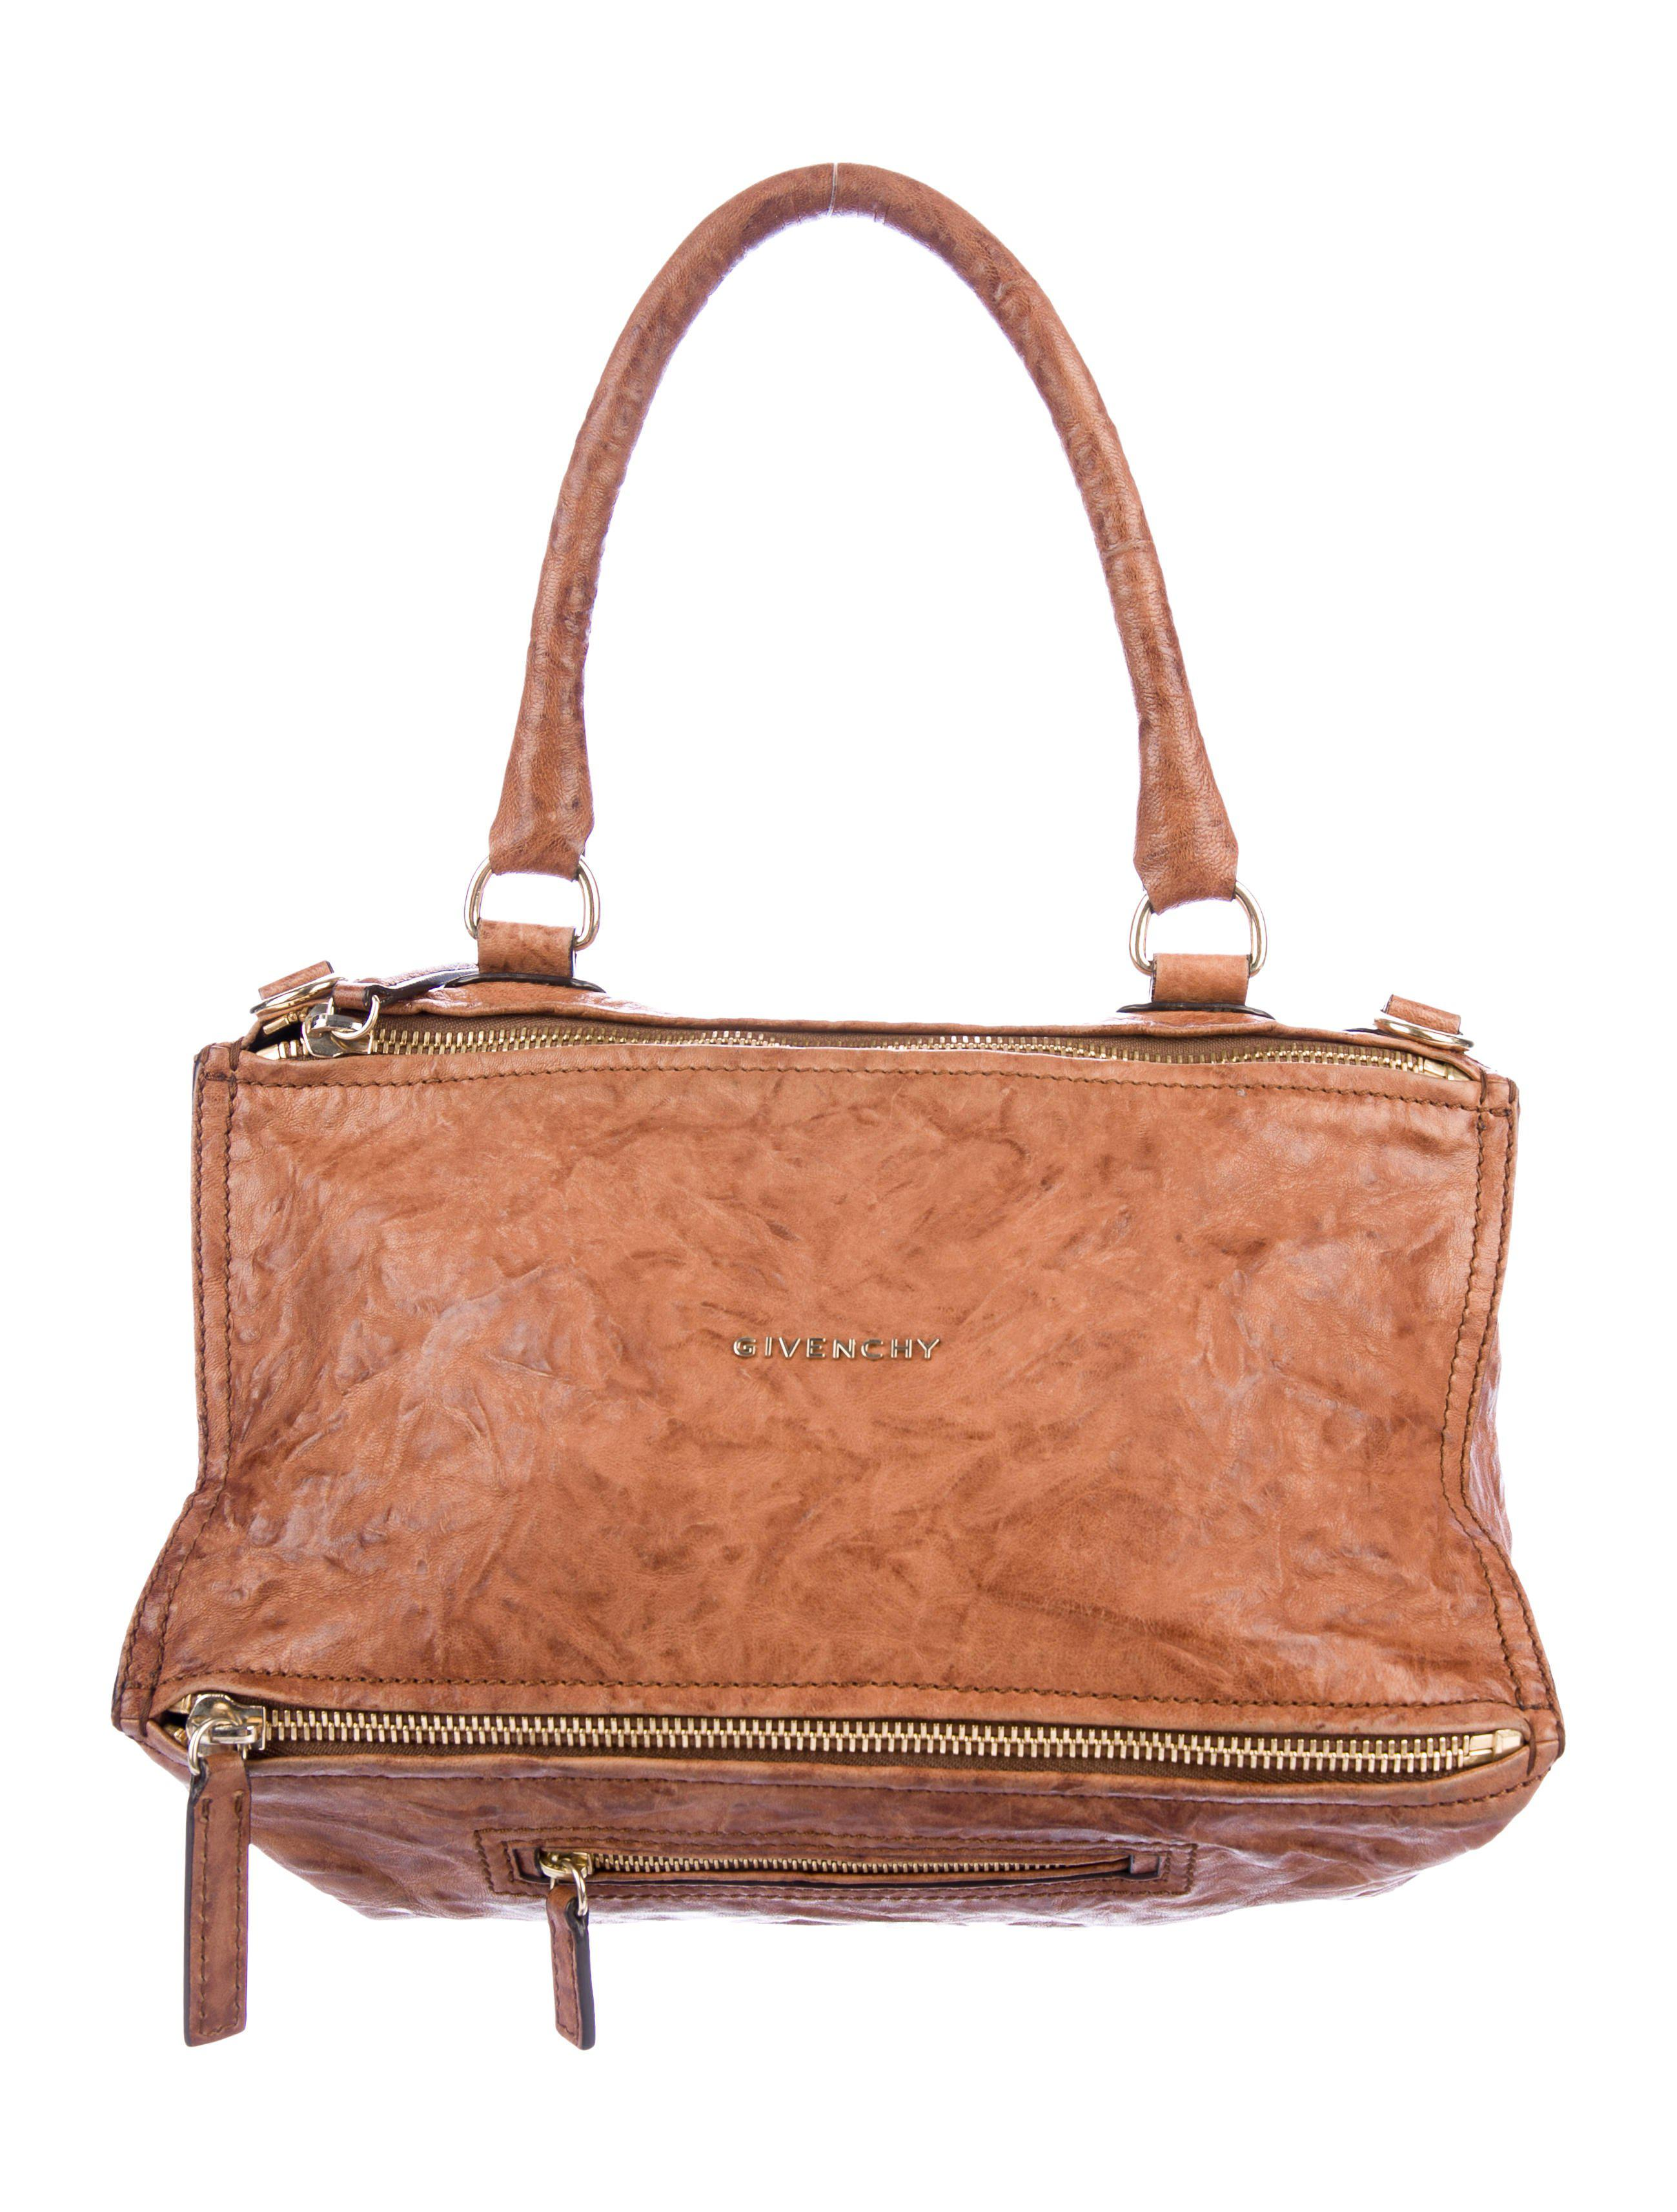 0643a18cb4 Givenchy - Metallic Medium Pandora Bag Tan - Lyst. View fullscreen